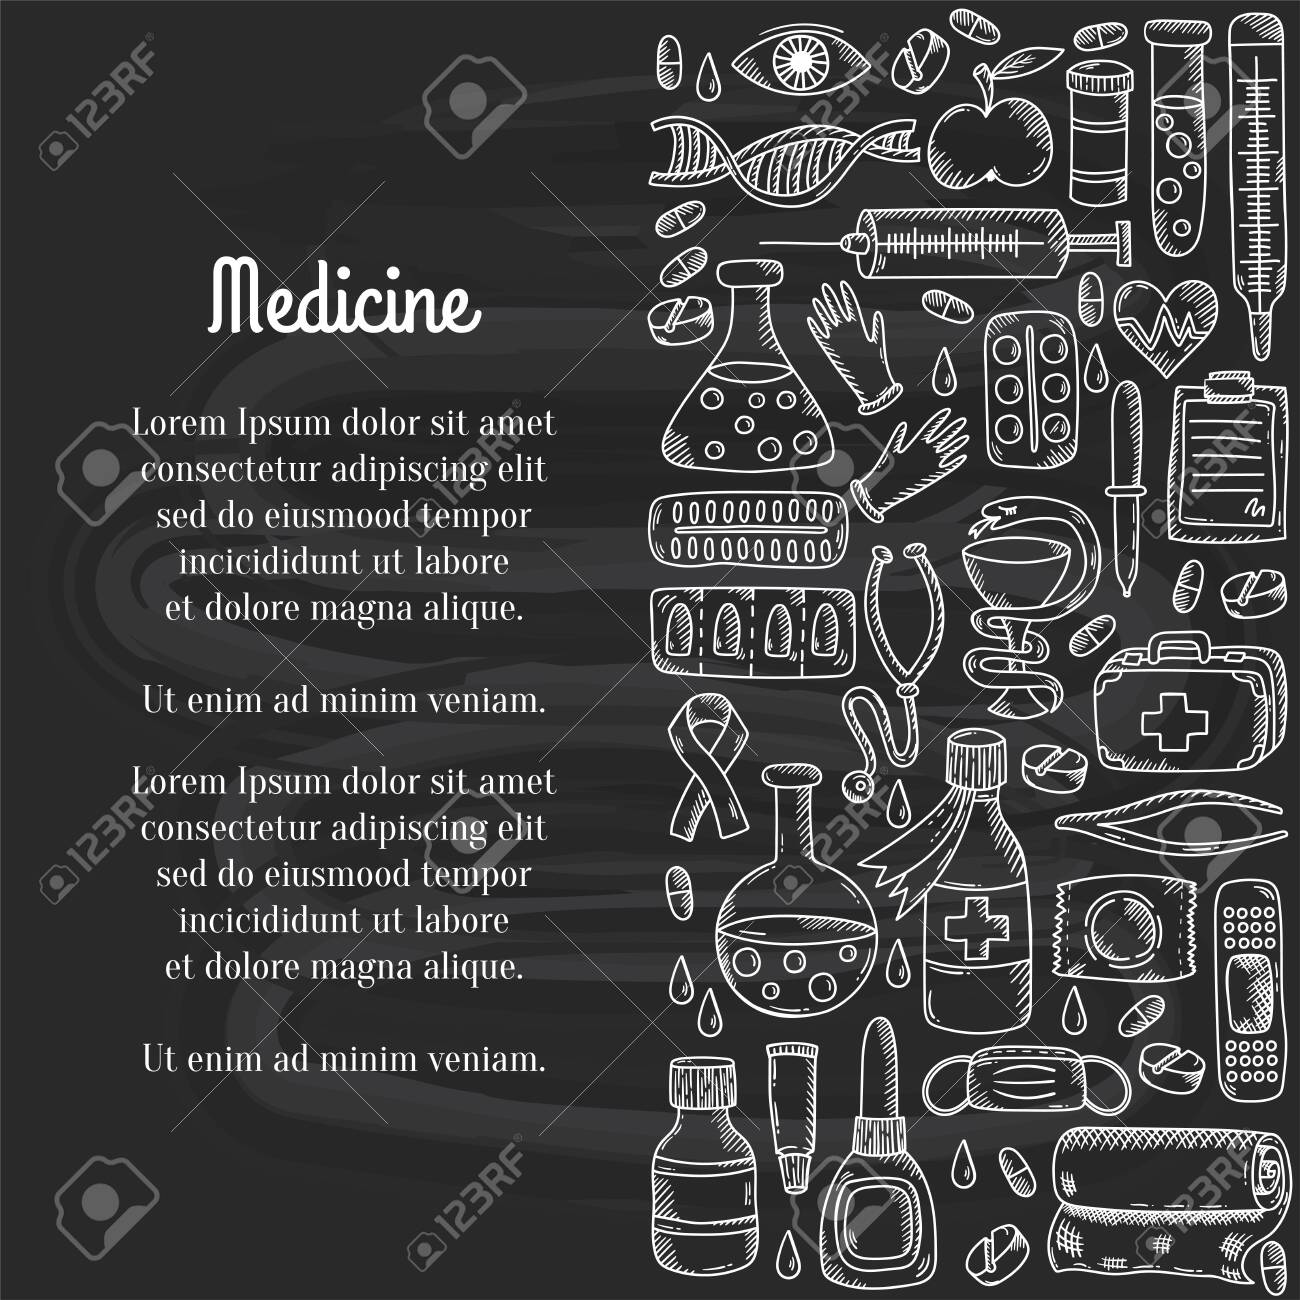 Medcine doodle icons decorative row border vector illustration - 149063847